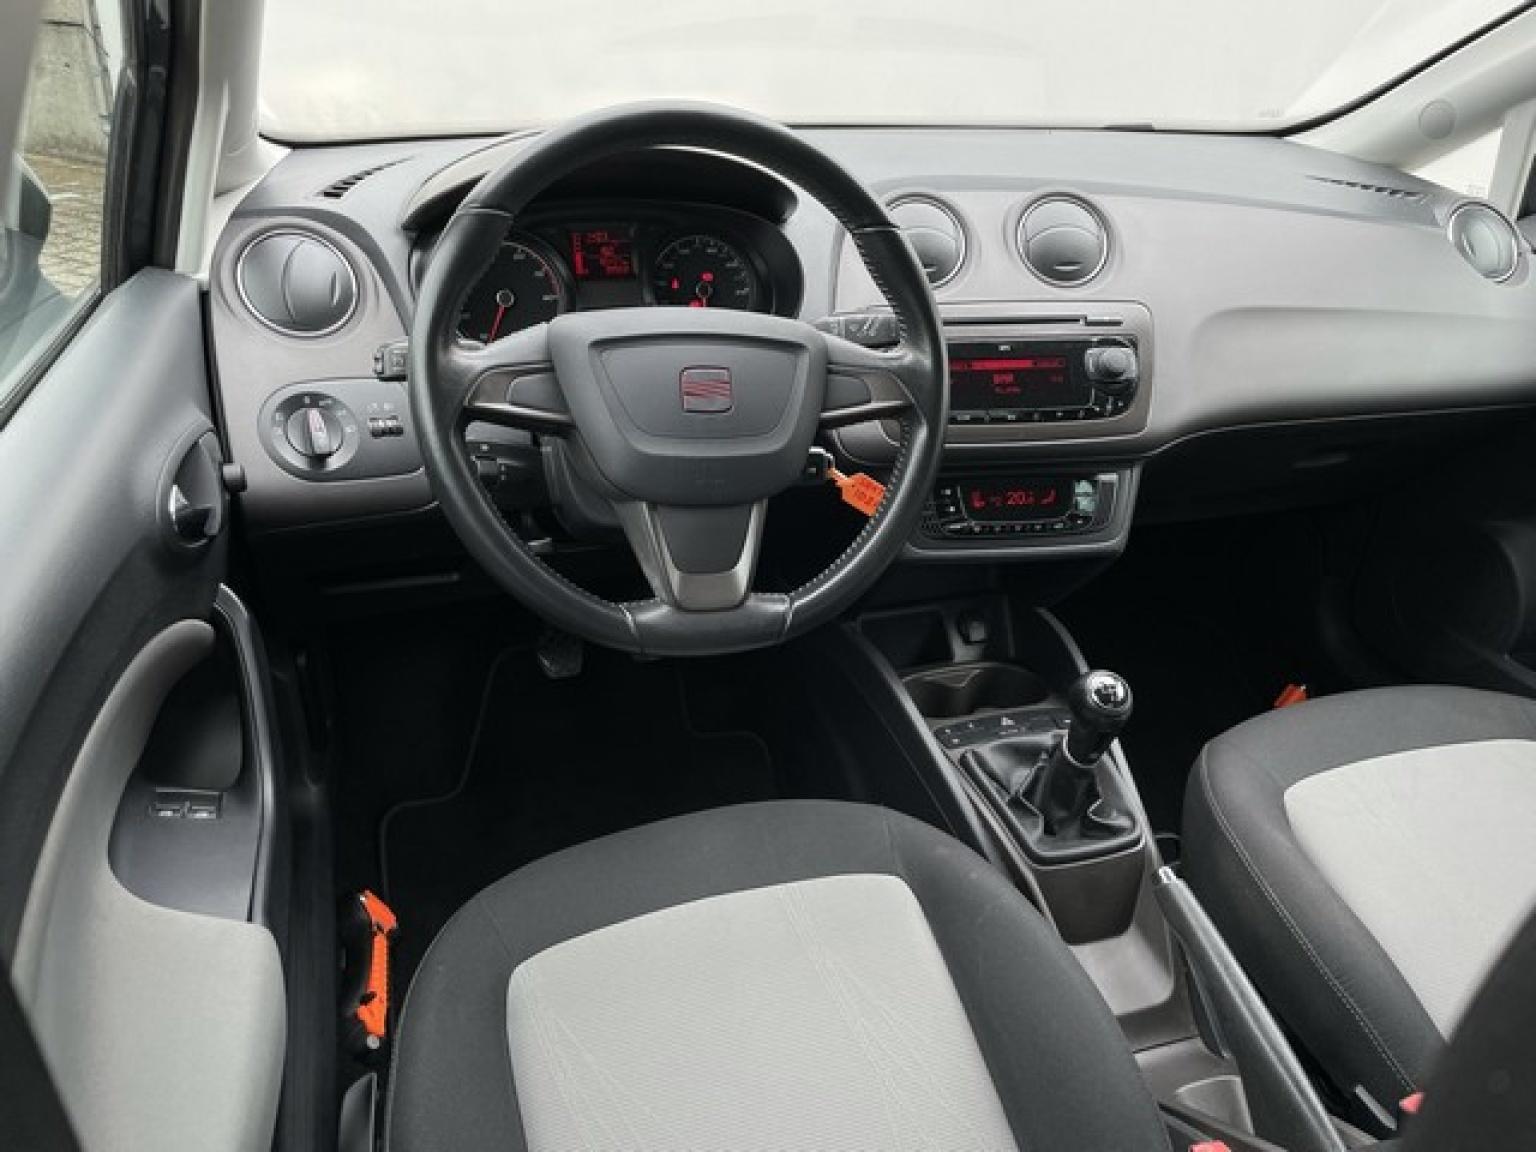 SEAT-Ibiza-7